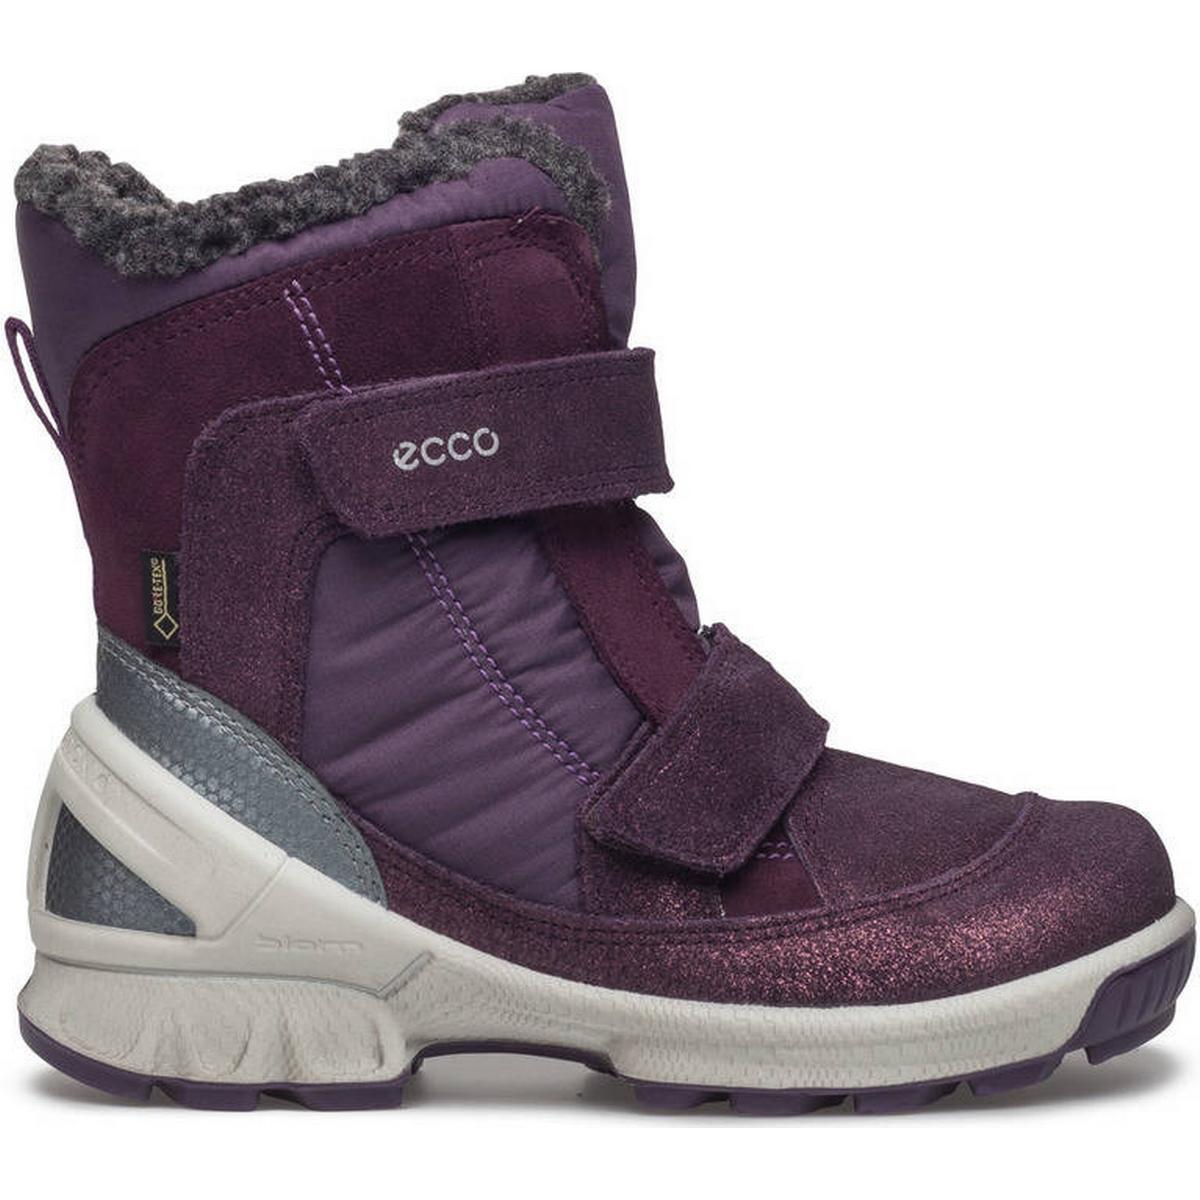 Ecco Sportssko Børnesko (6 produkter) • Se billigste pris nu »